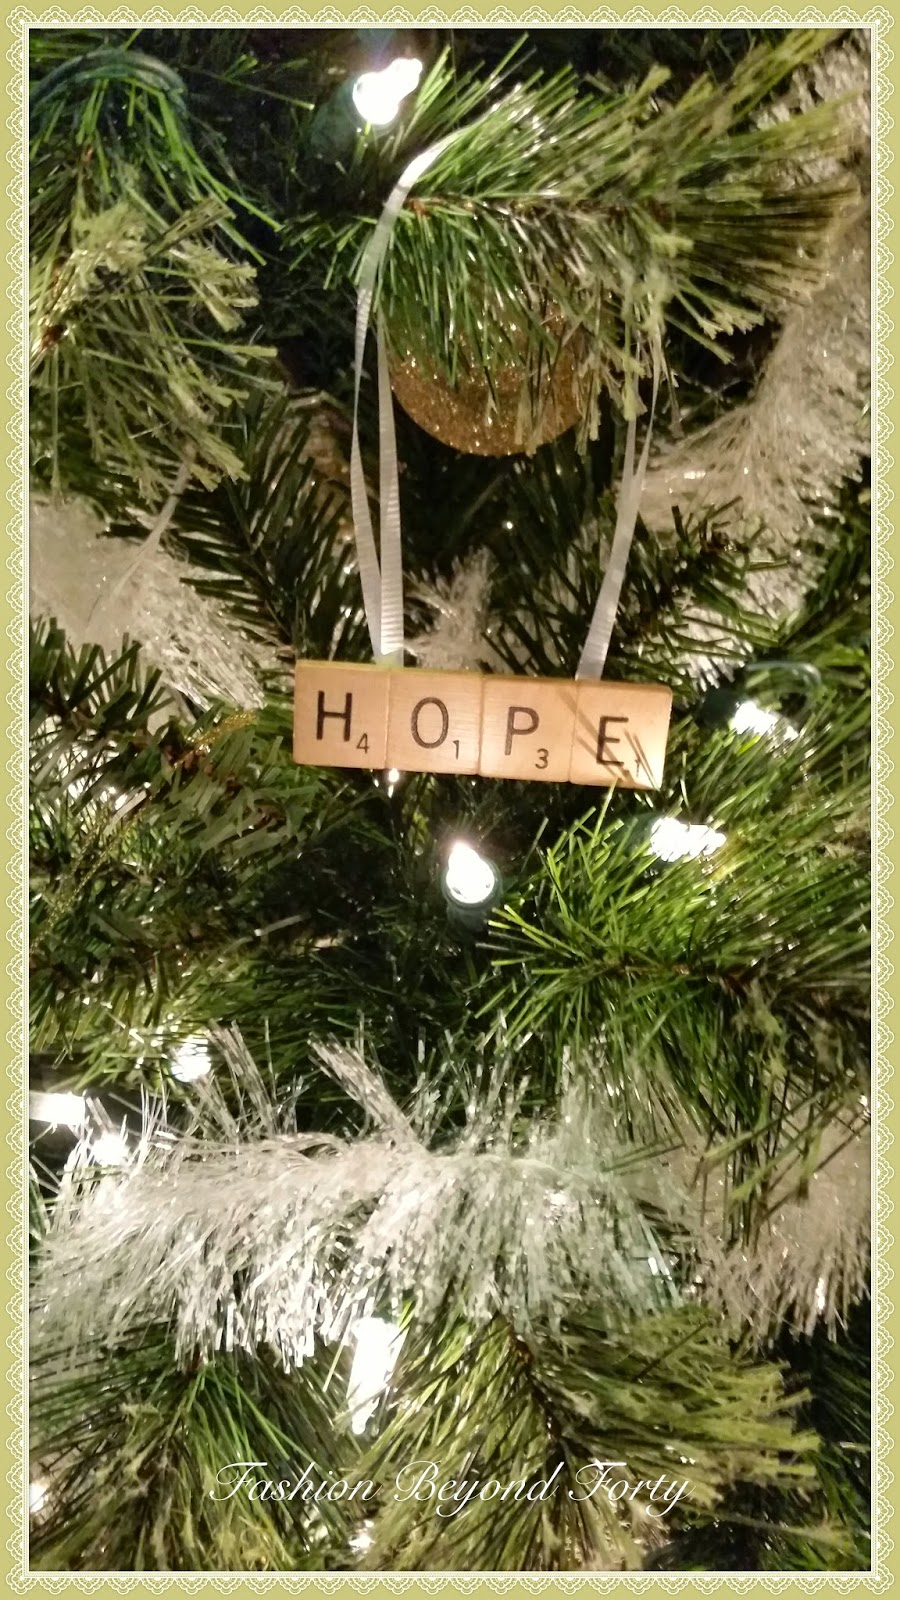 Season of Hope Fashion Beyond Forty